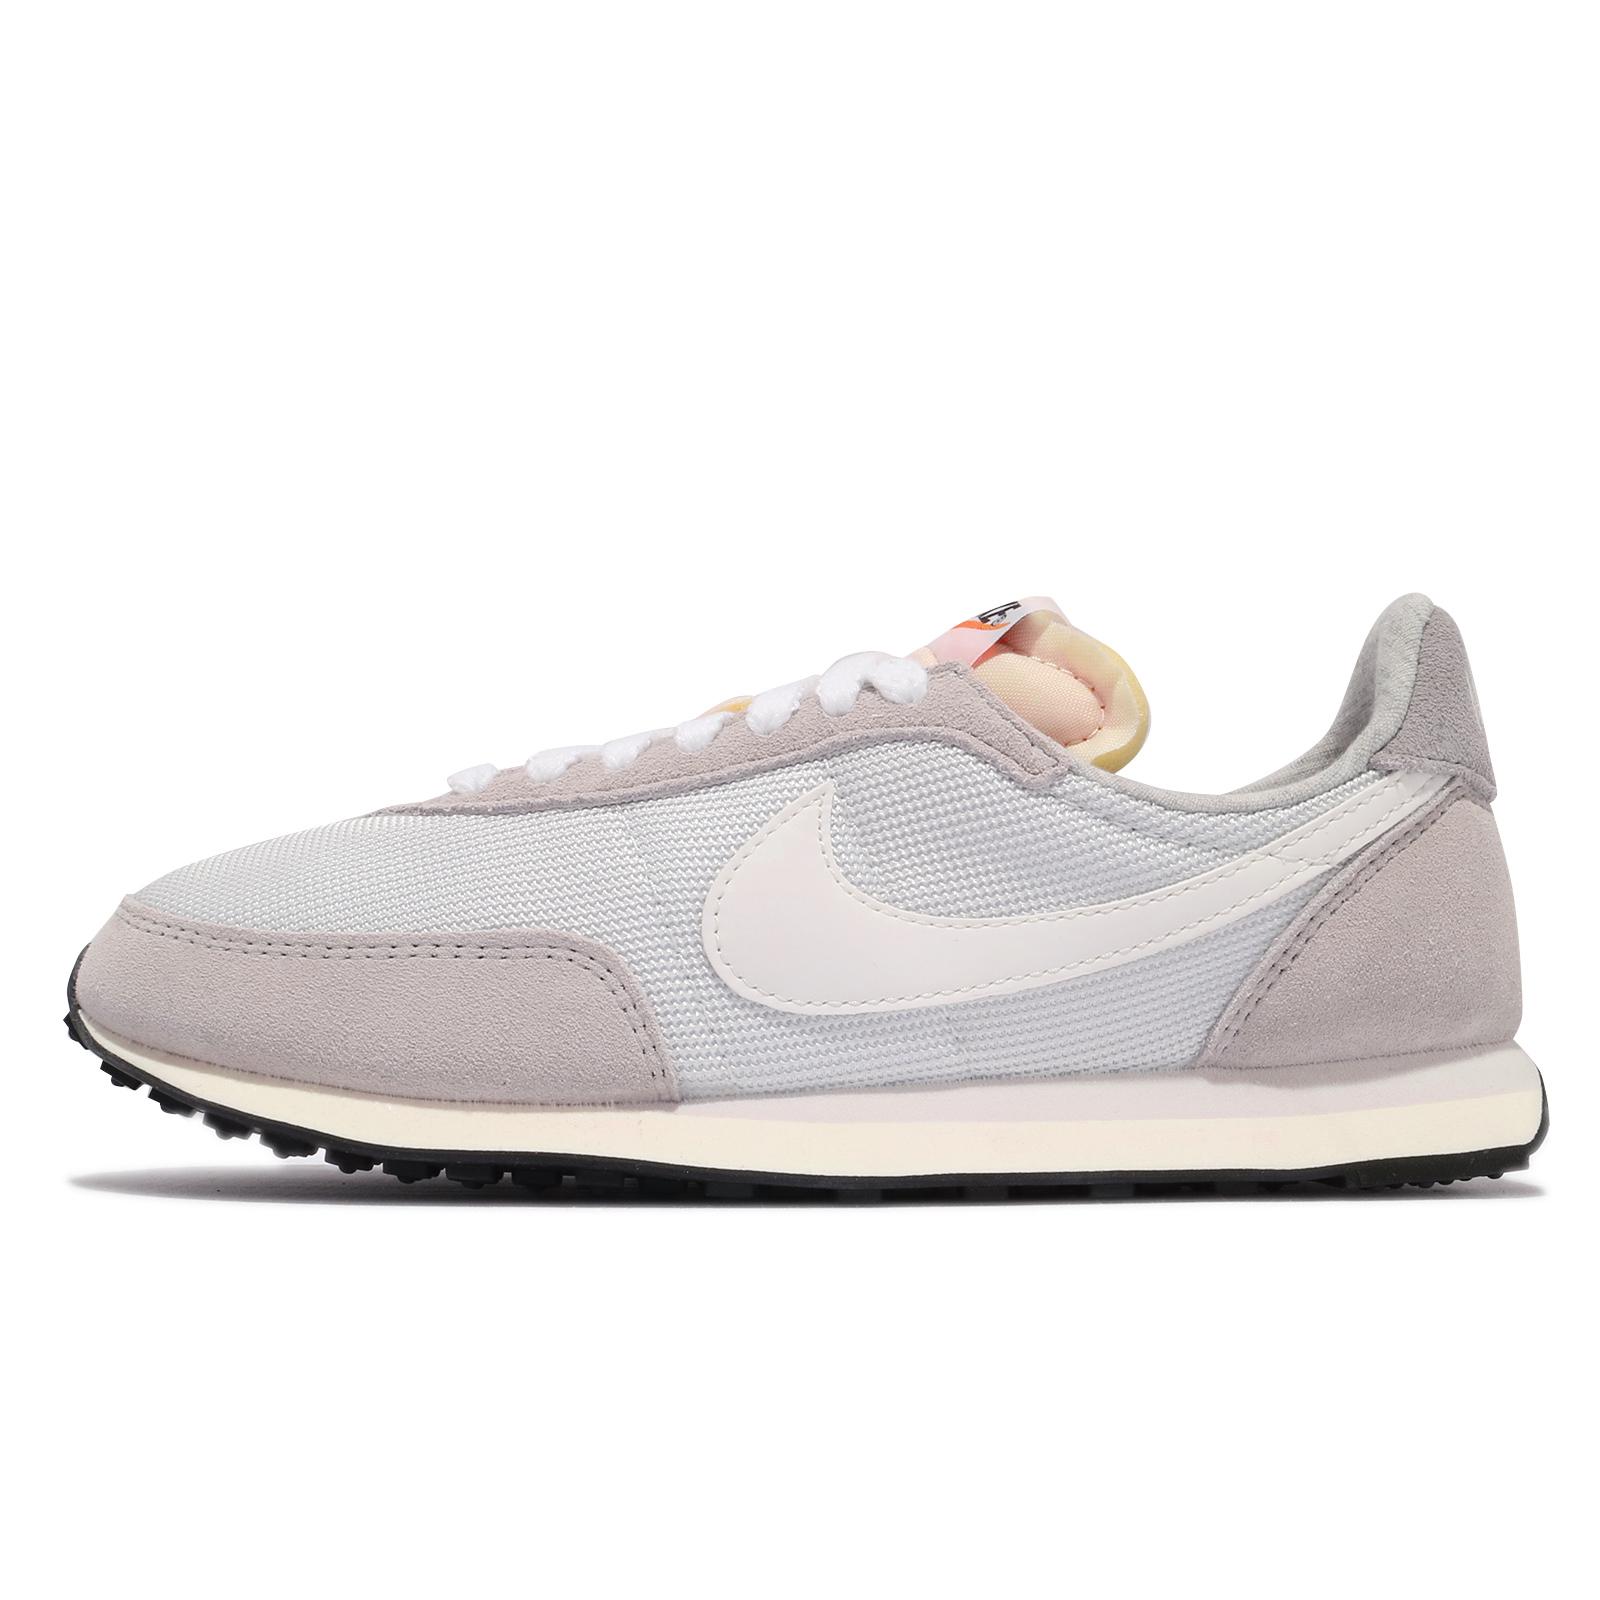 Nike 休閒鞋 Wmns Waffle Trainer 2 SE 復古 灰 麂皮 女鞋【ACS】 DM9091-011